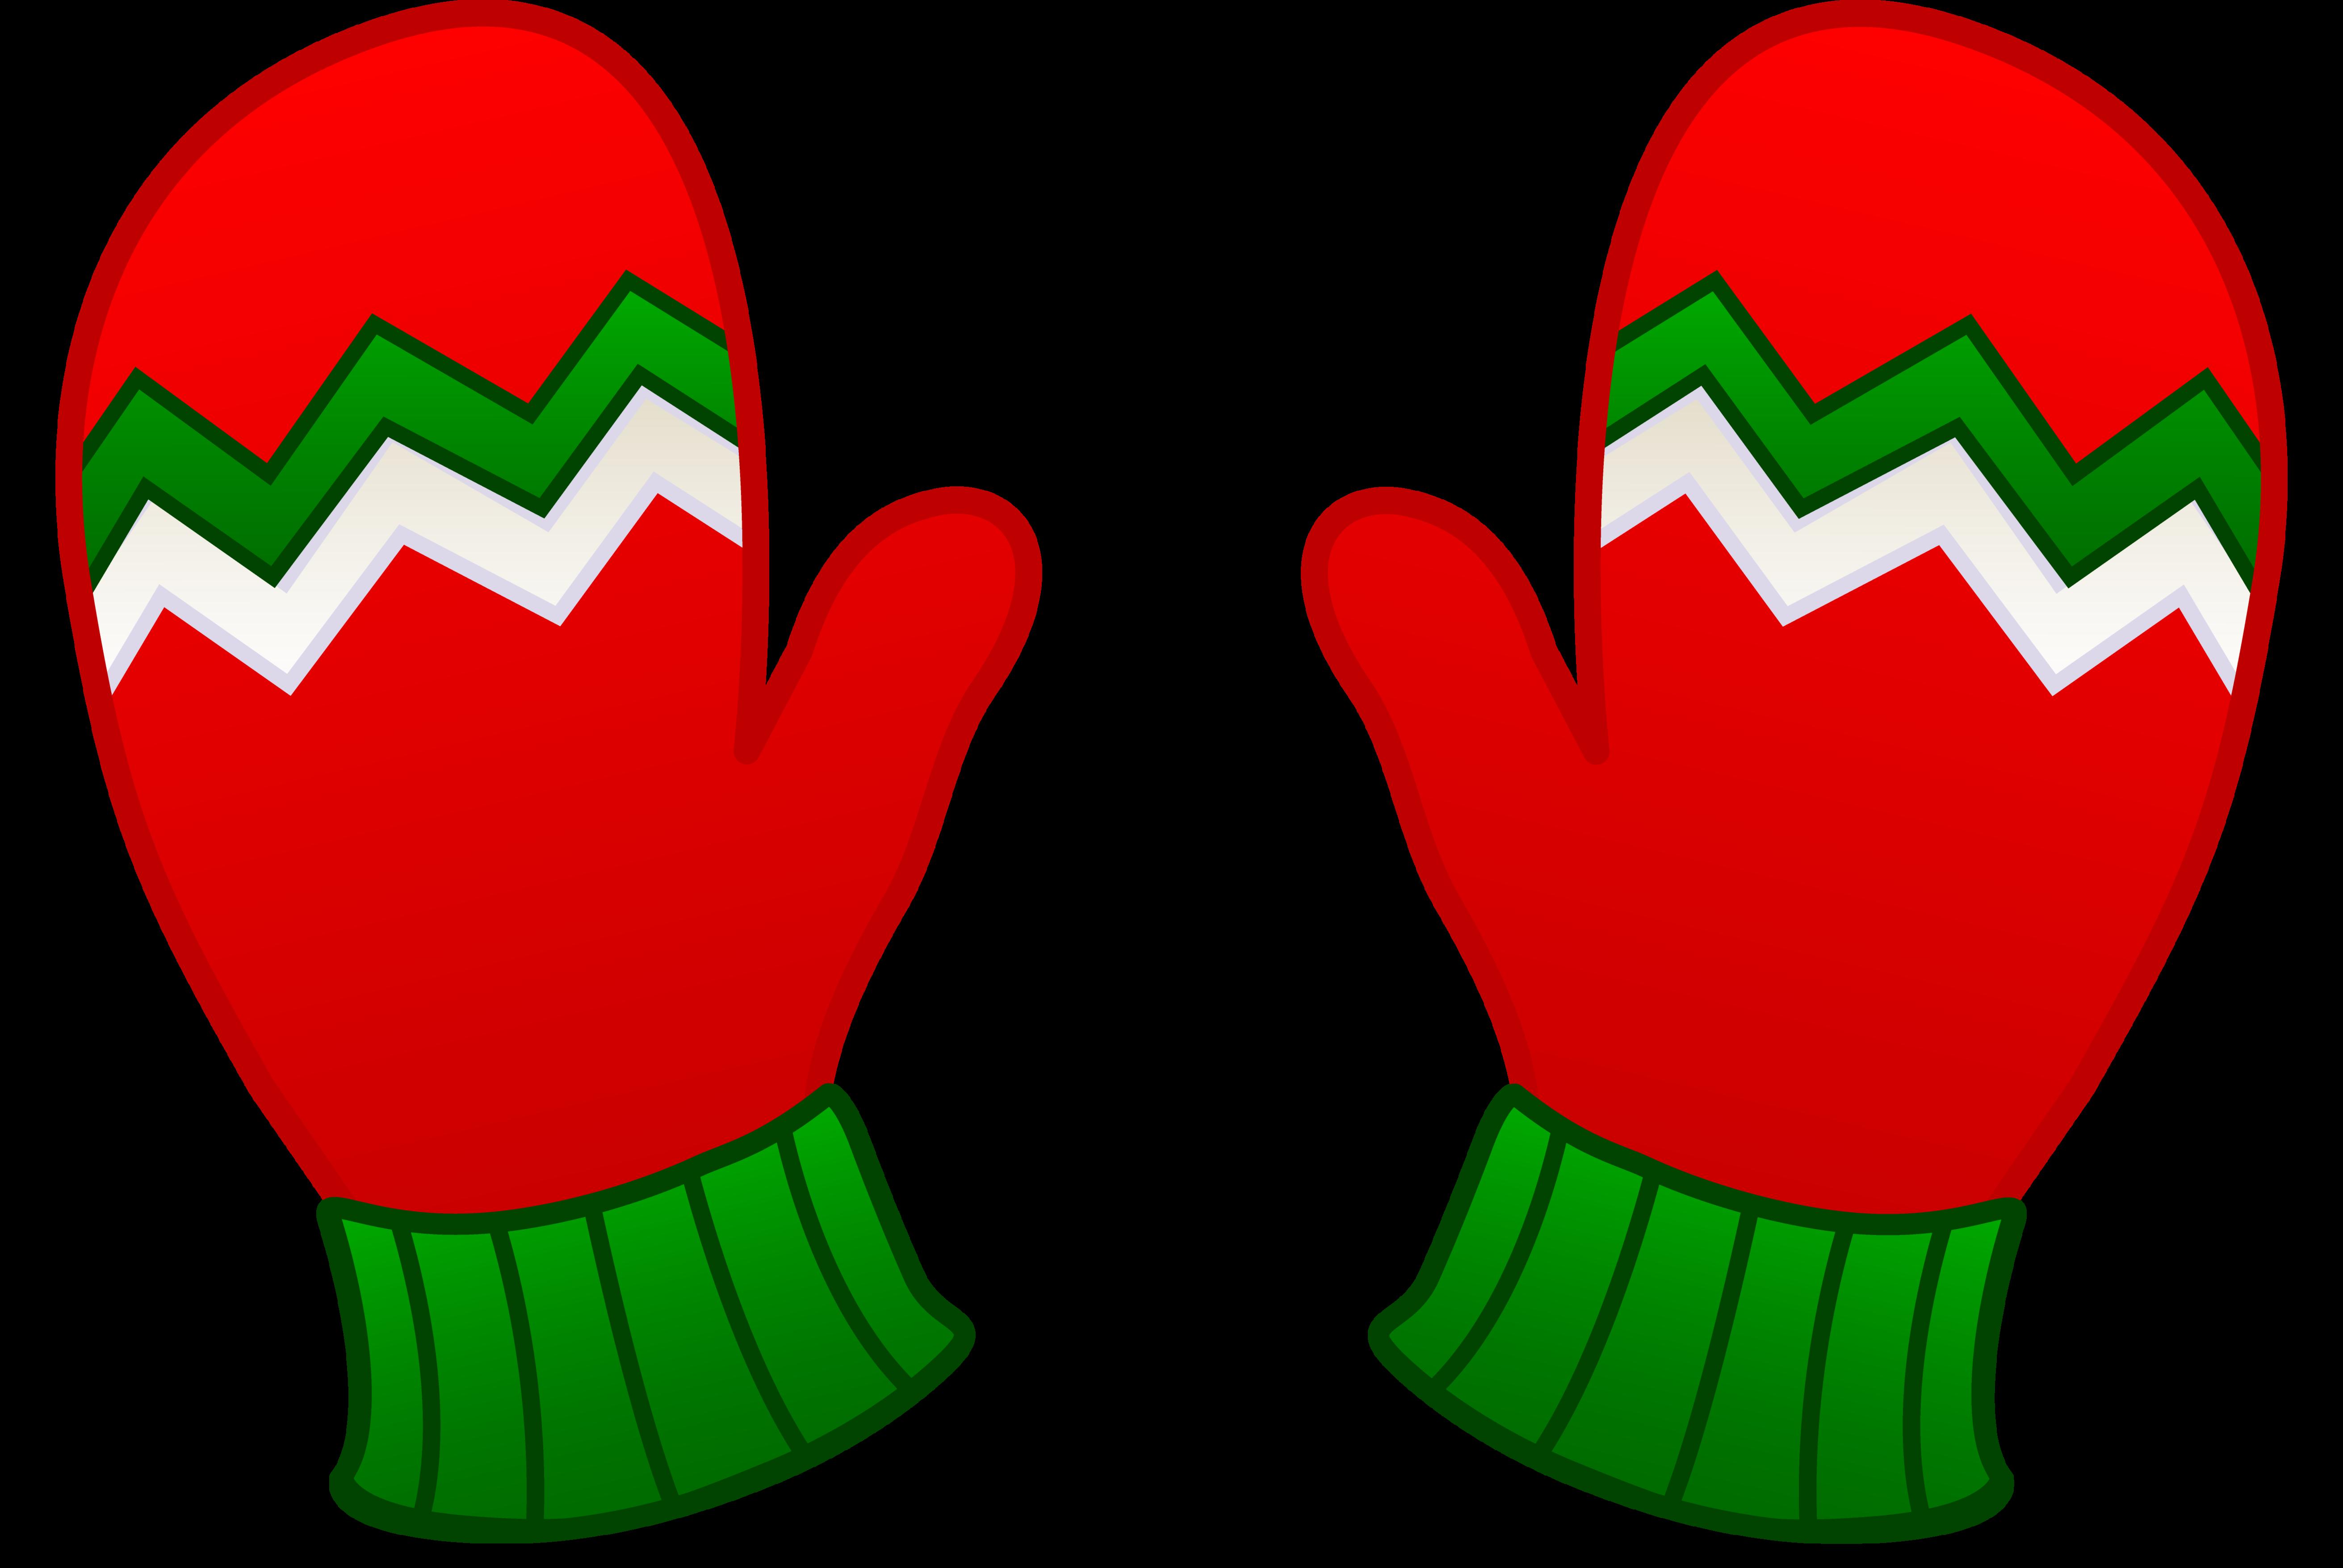 Mittens clipart laurie. Gloves woolen cap free